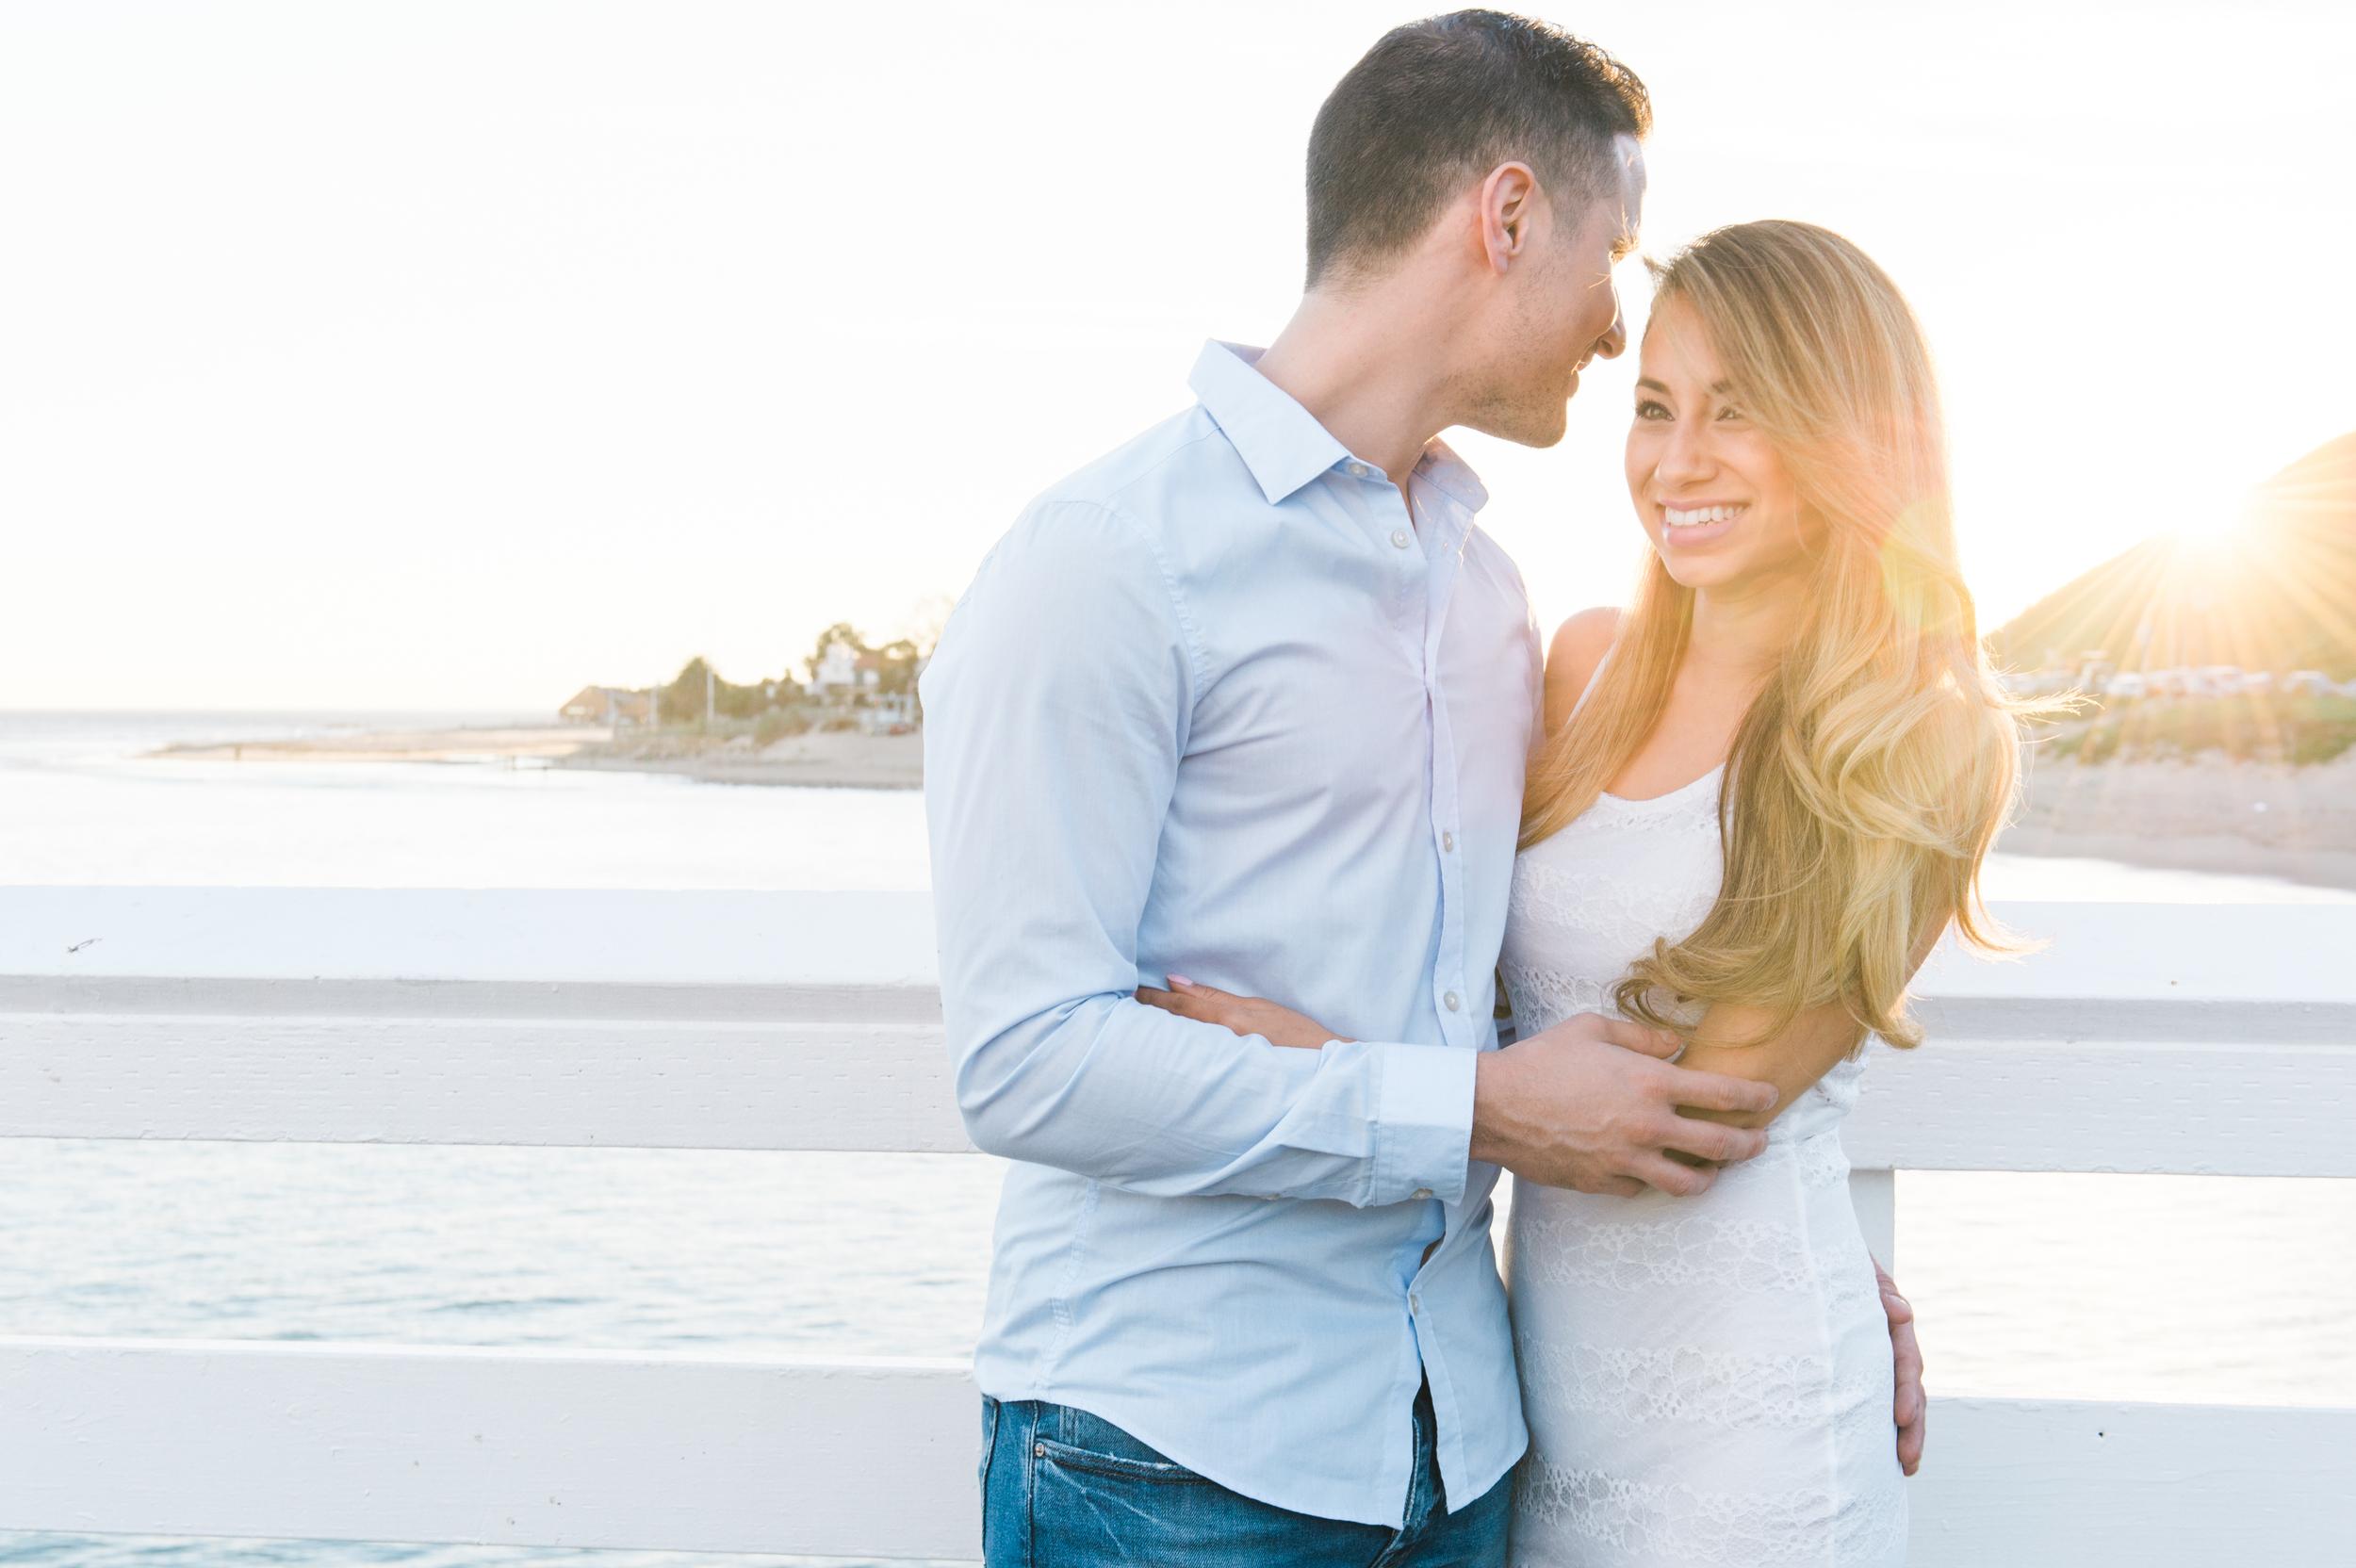 Engagement Photos at the Malibu Pier